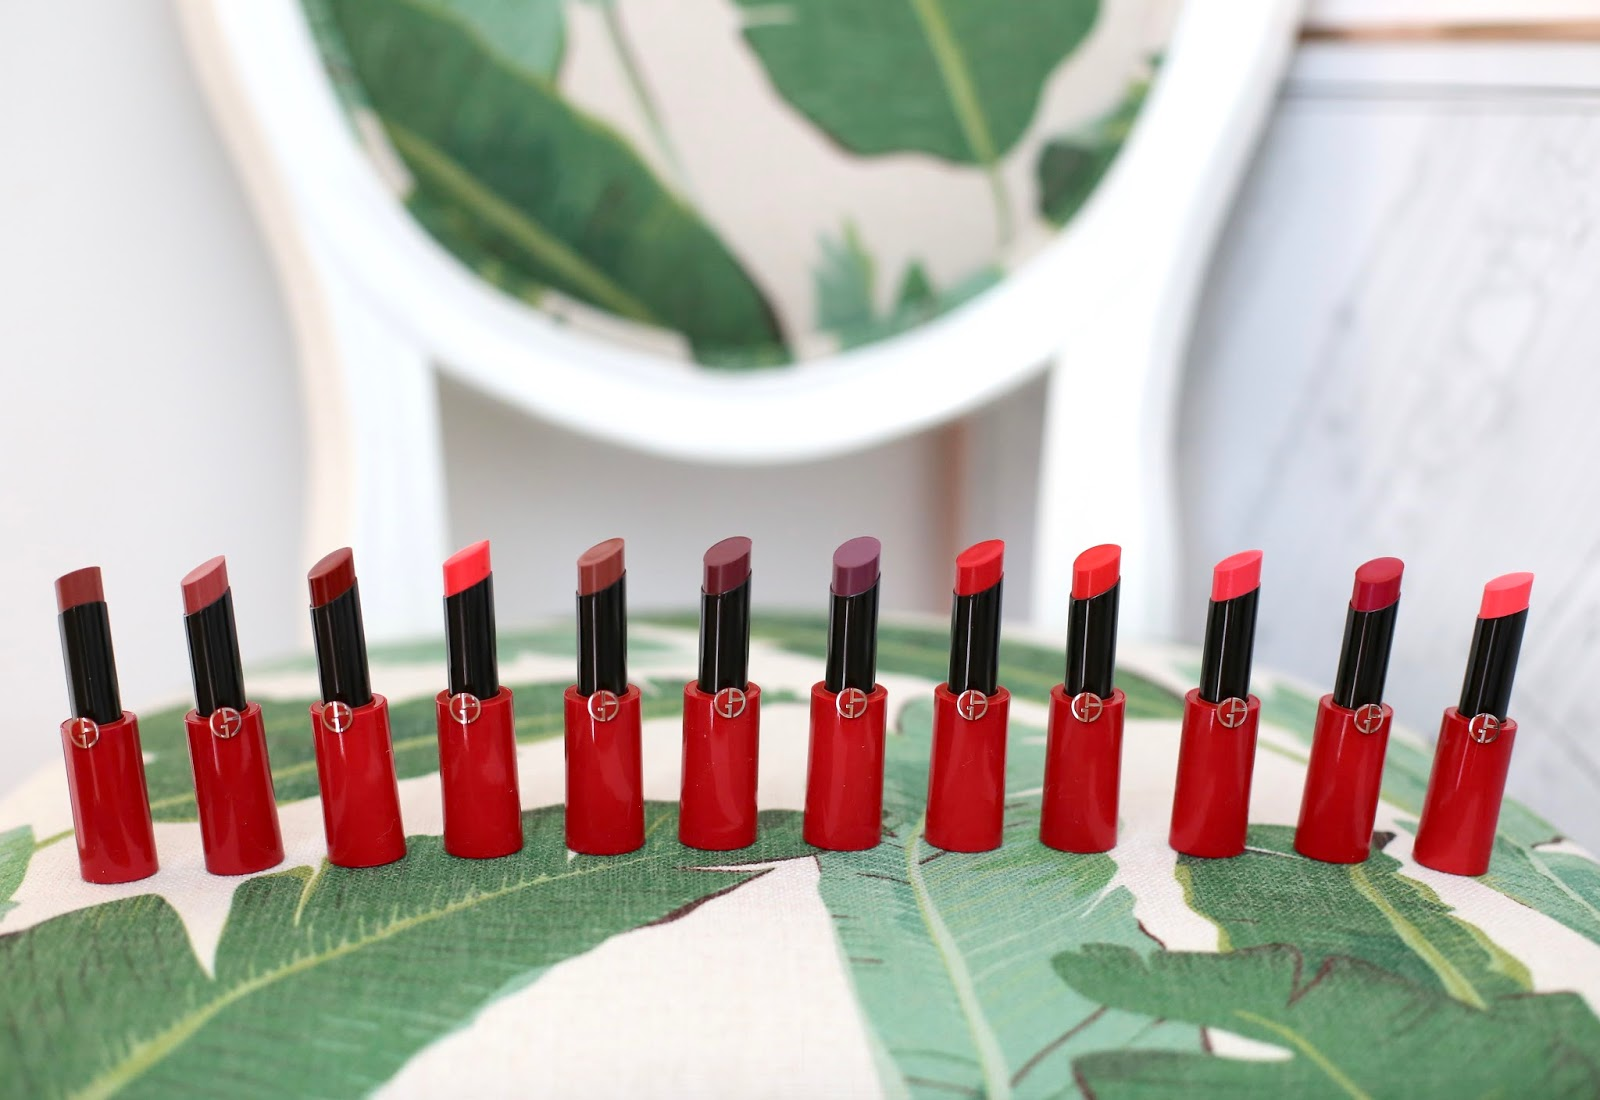 Armani Ecstasy Shine lipsticks